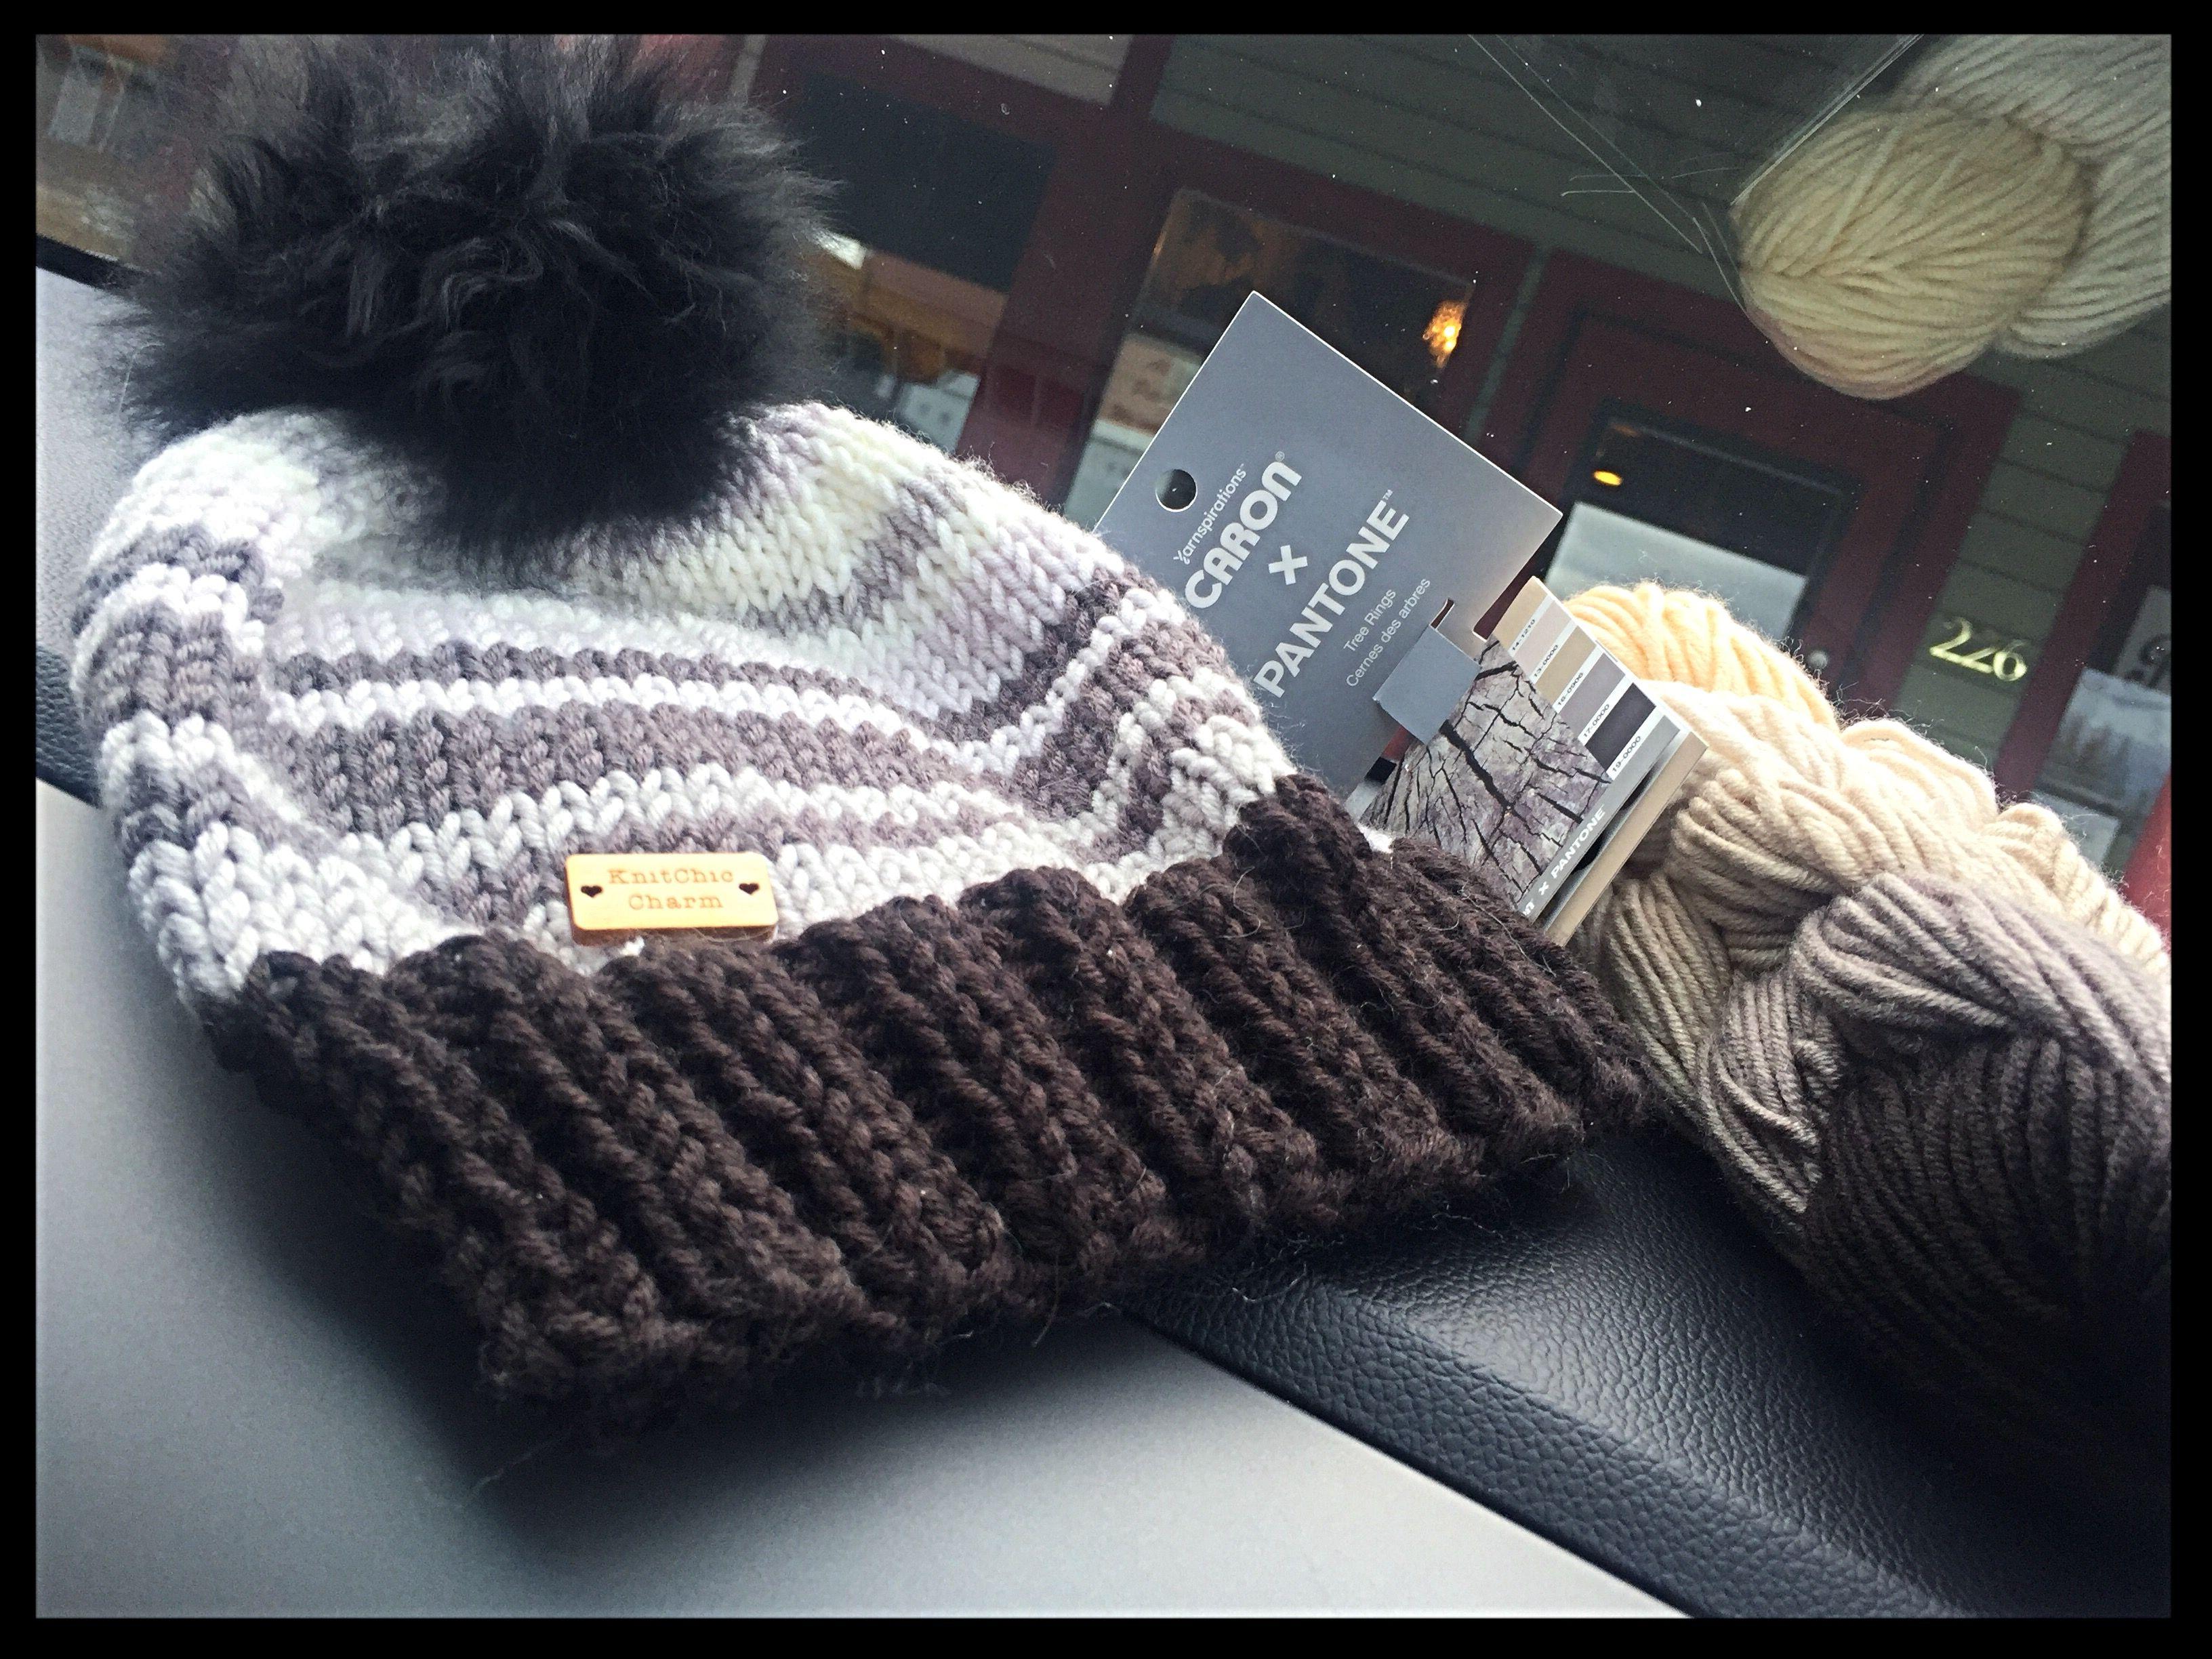 Caron pantone yarn used to knit their free stripe hat